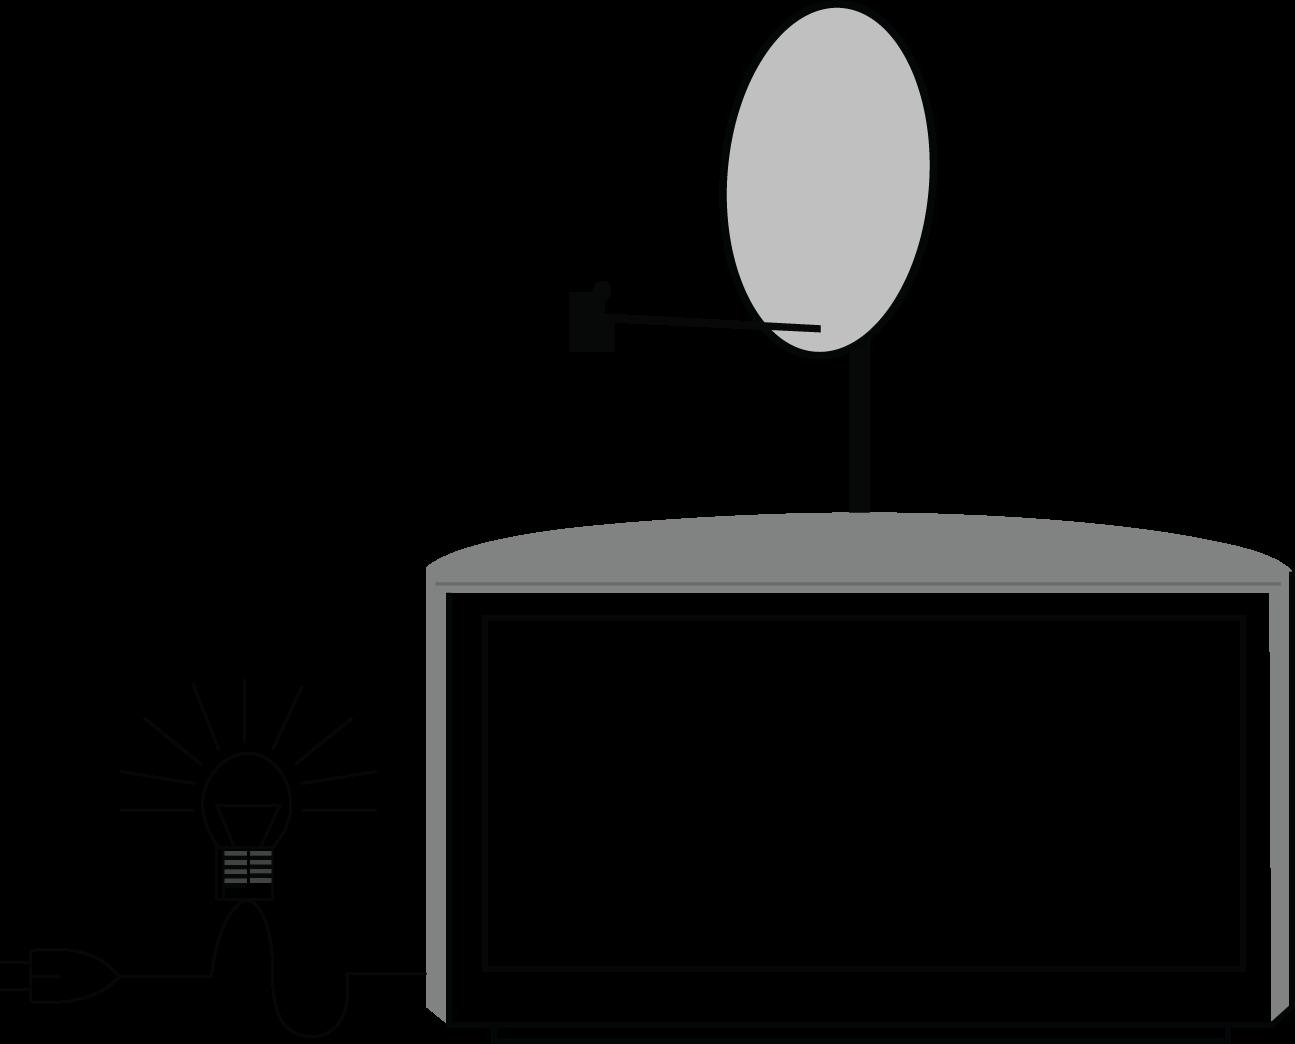 Elektro Stroosnijder-Zierikzee